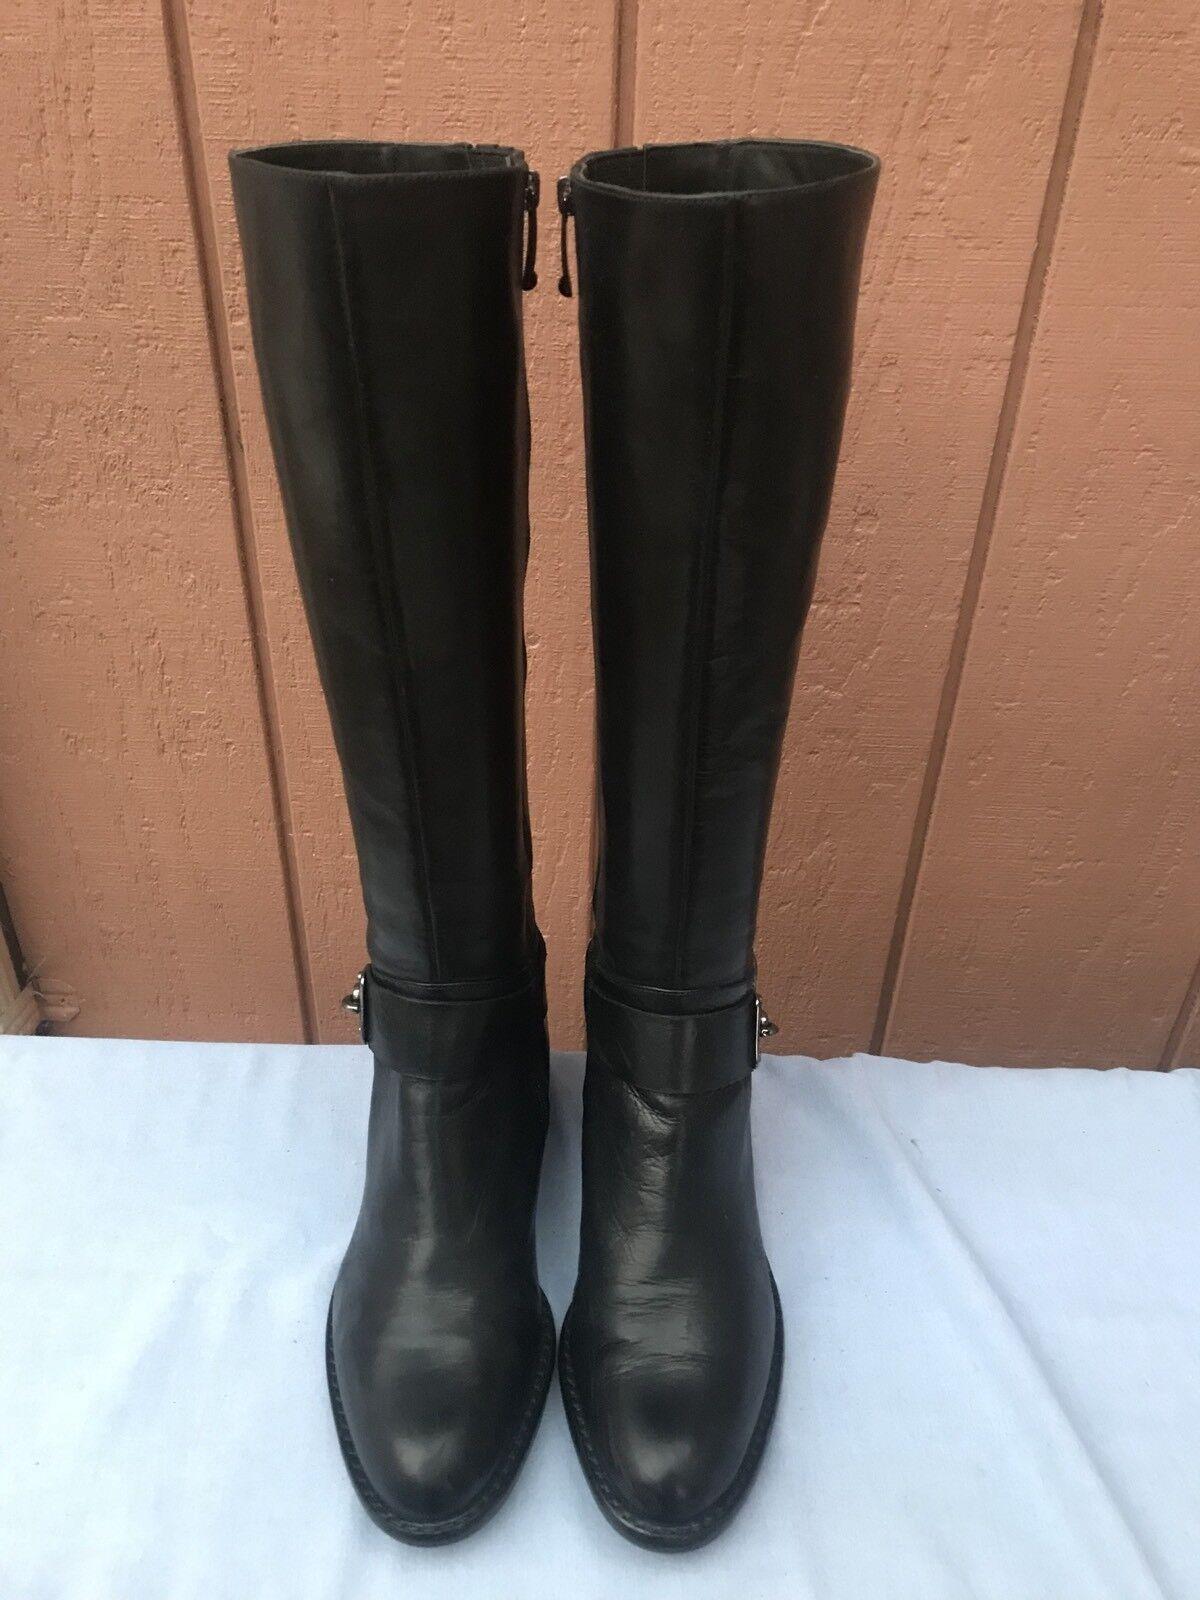 Excelente condición usada Via Spiga Kali Alto Alto Alto Rodilla Alto De Cuero Negro botas De Montar Talla EE. UU. 5M  398 c6dd29